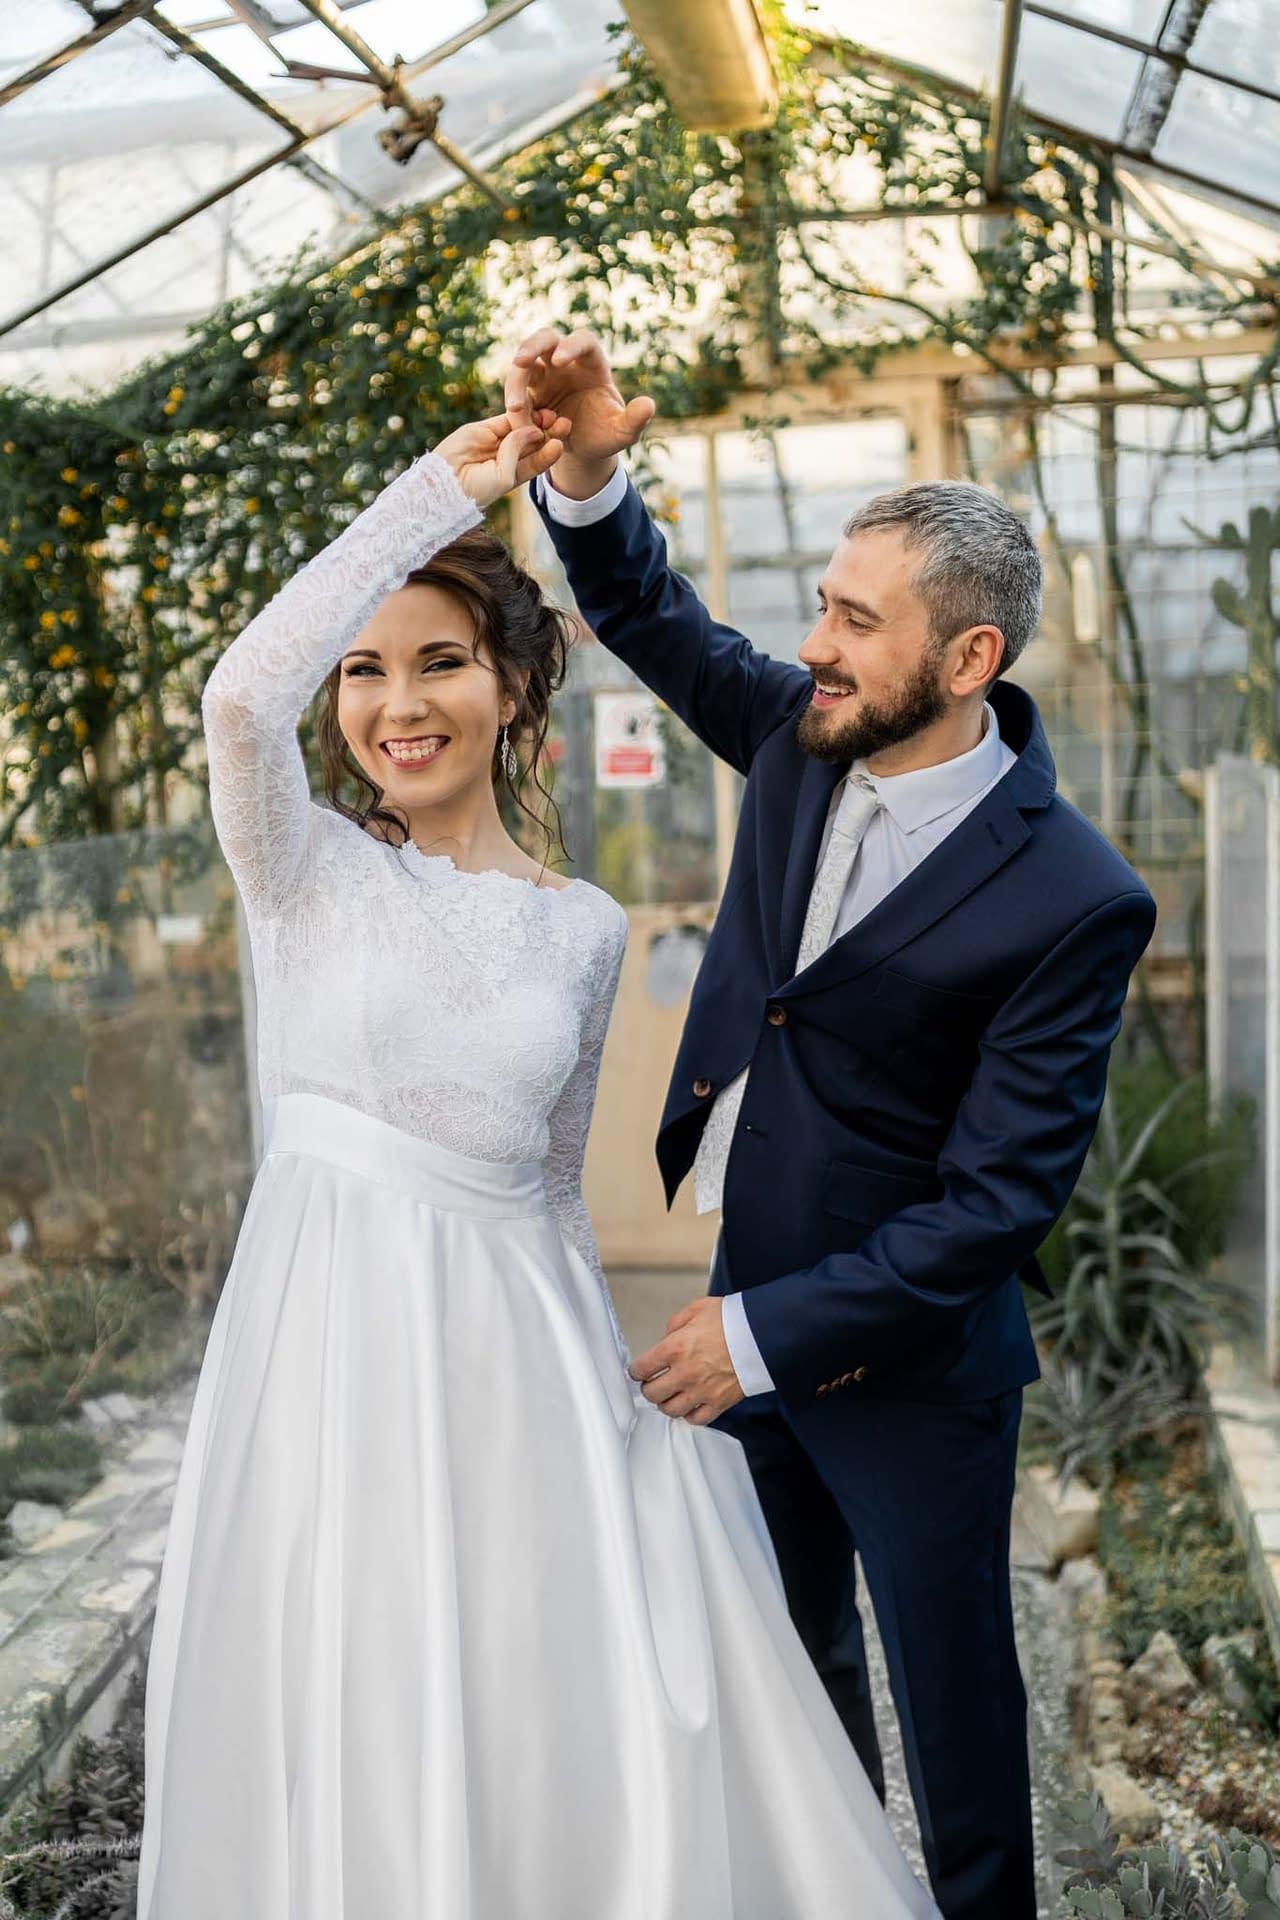 svadobne fotky bratislava